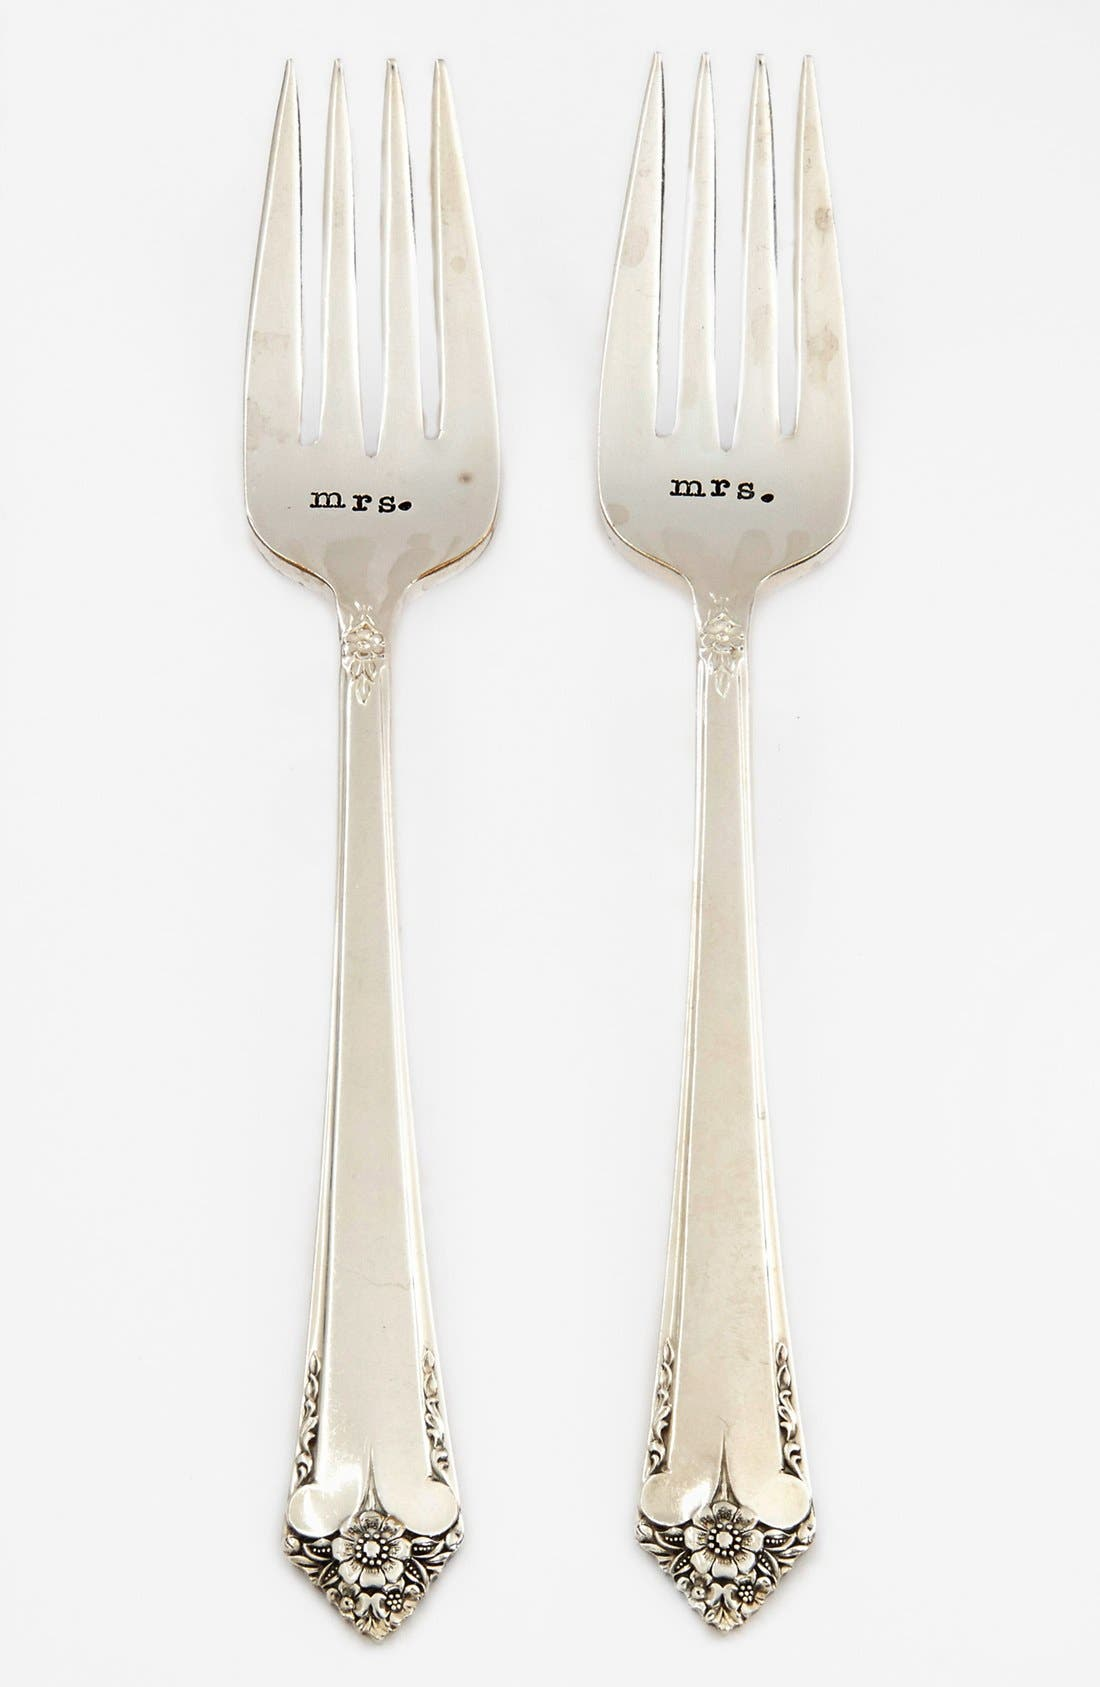 Alternate Image 1 Selected - Milk and Honey Luxuries 'Mrs. & Mrs.' Vintage Wedding Forks (Set of 2)